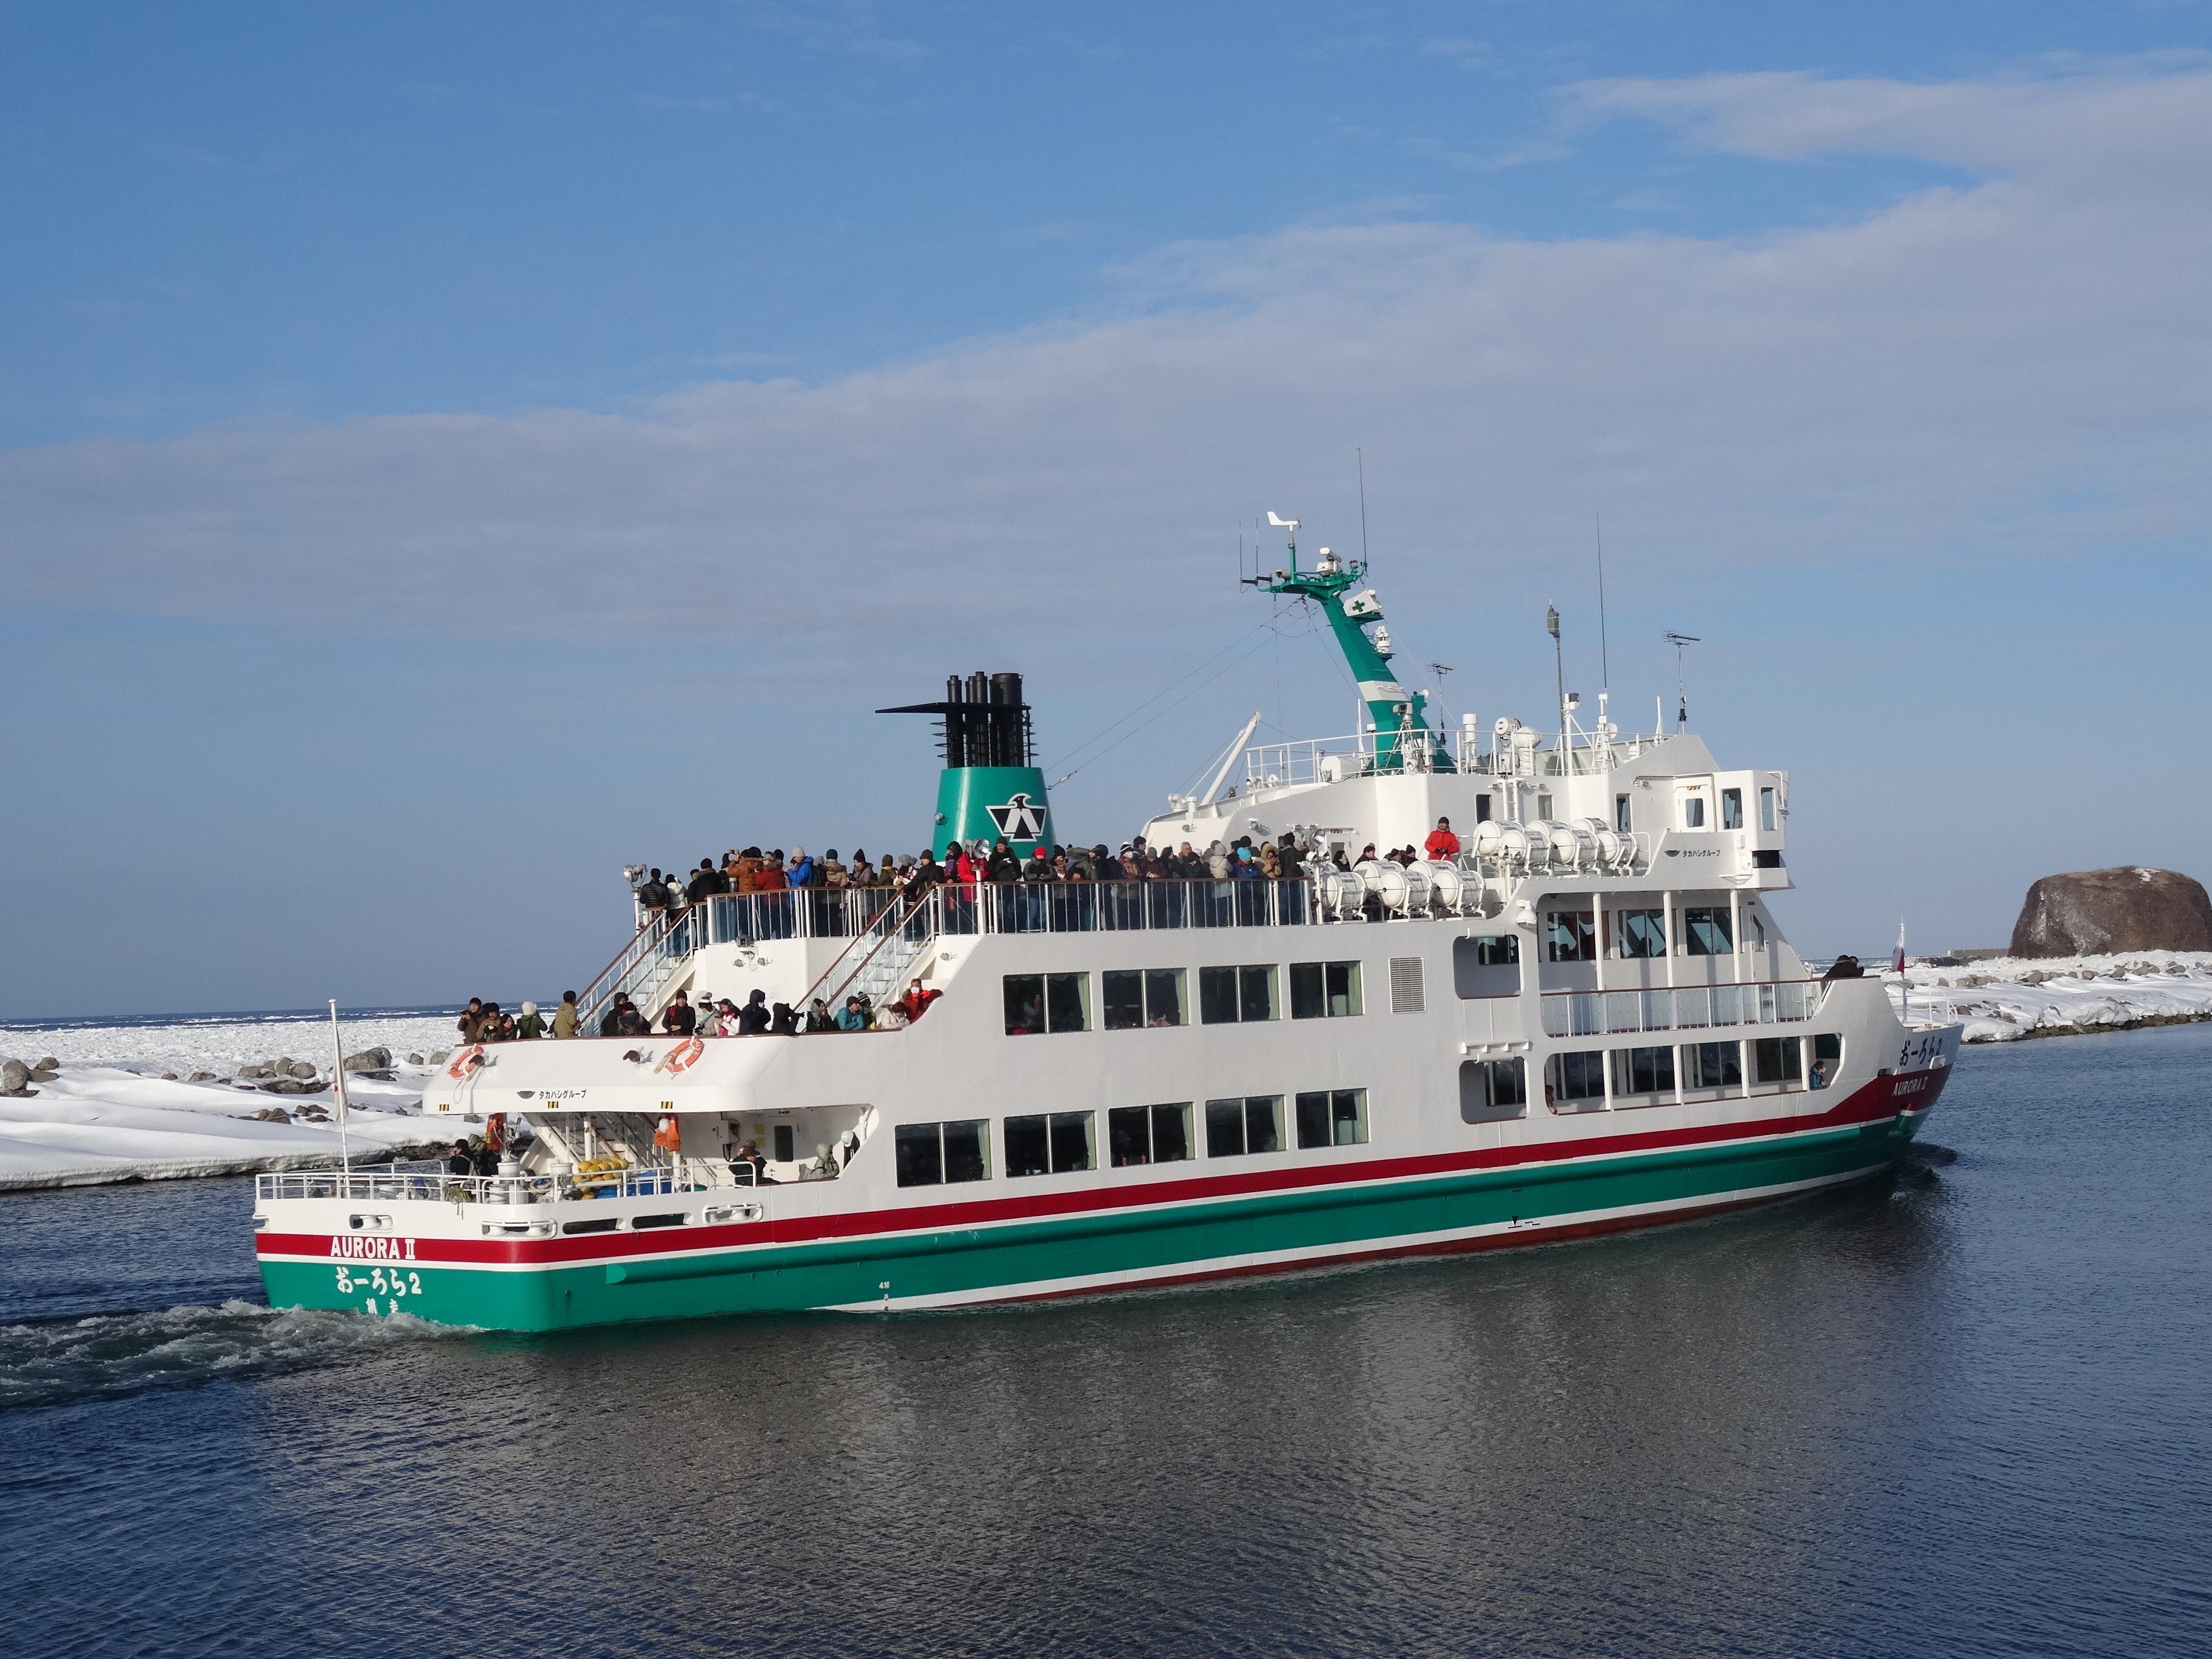 Day Tour of Mount Iō & Garinko II Icebreaker Cruise [Depart from Lake Akan]